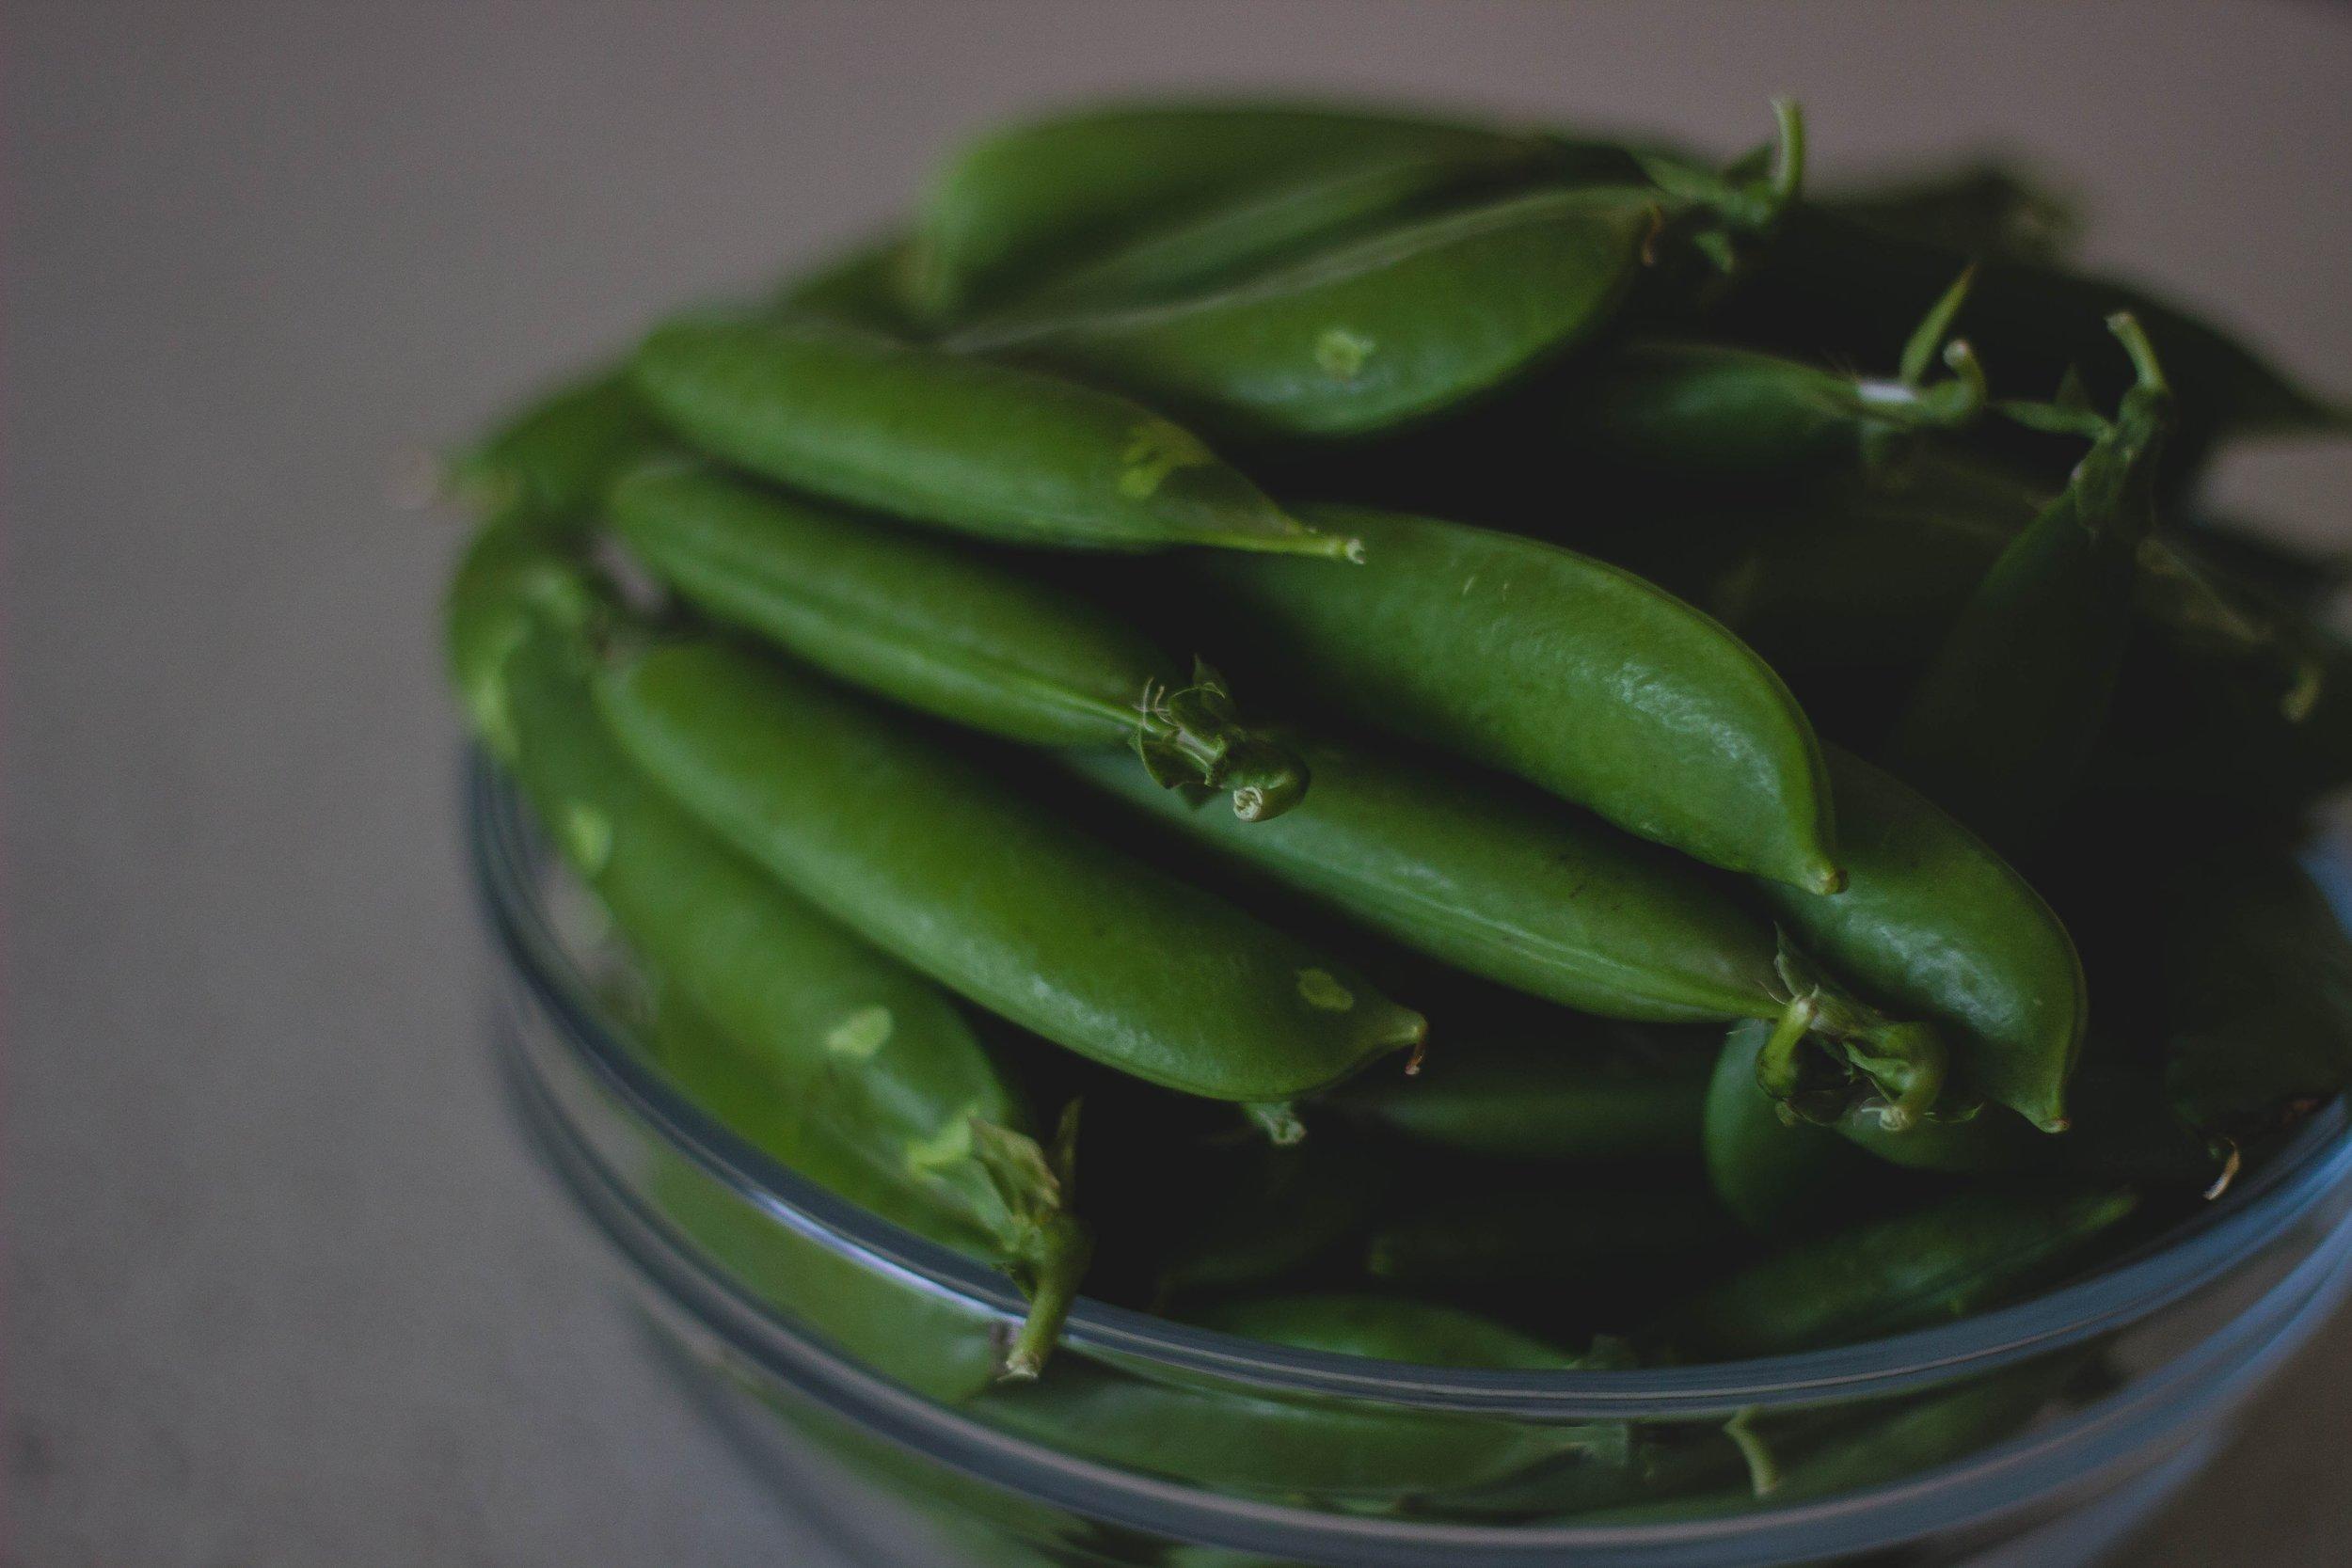 109 beans-bowl-close-up-185473.jpg